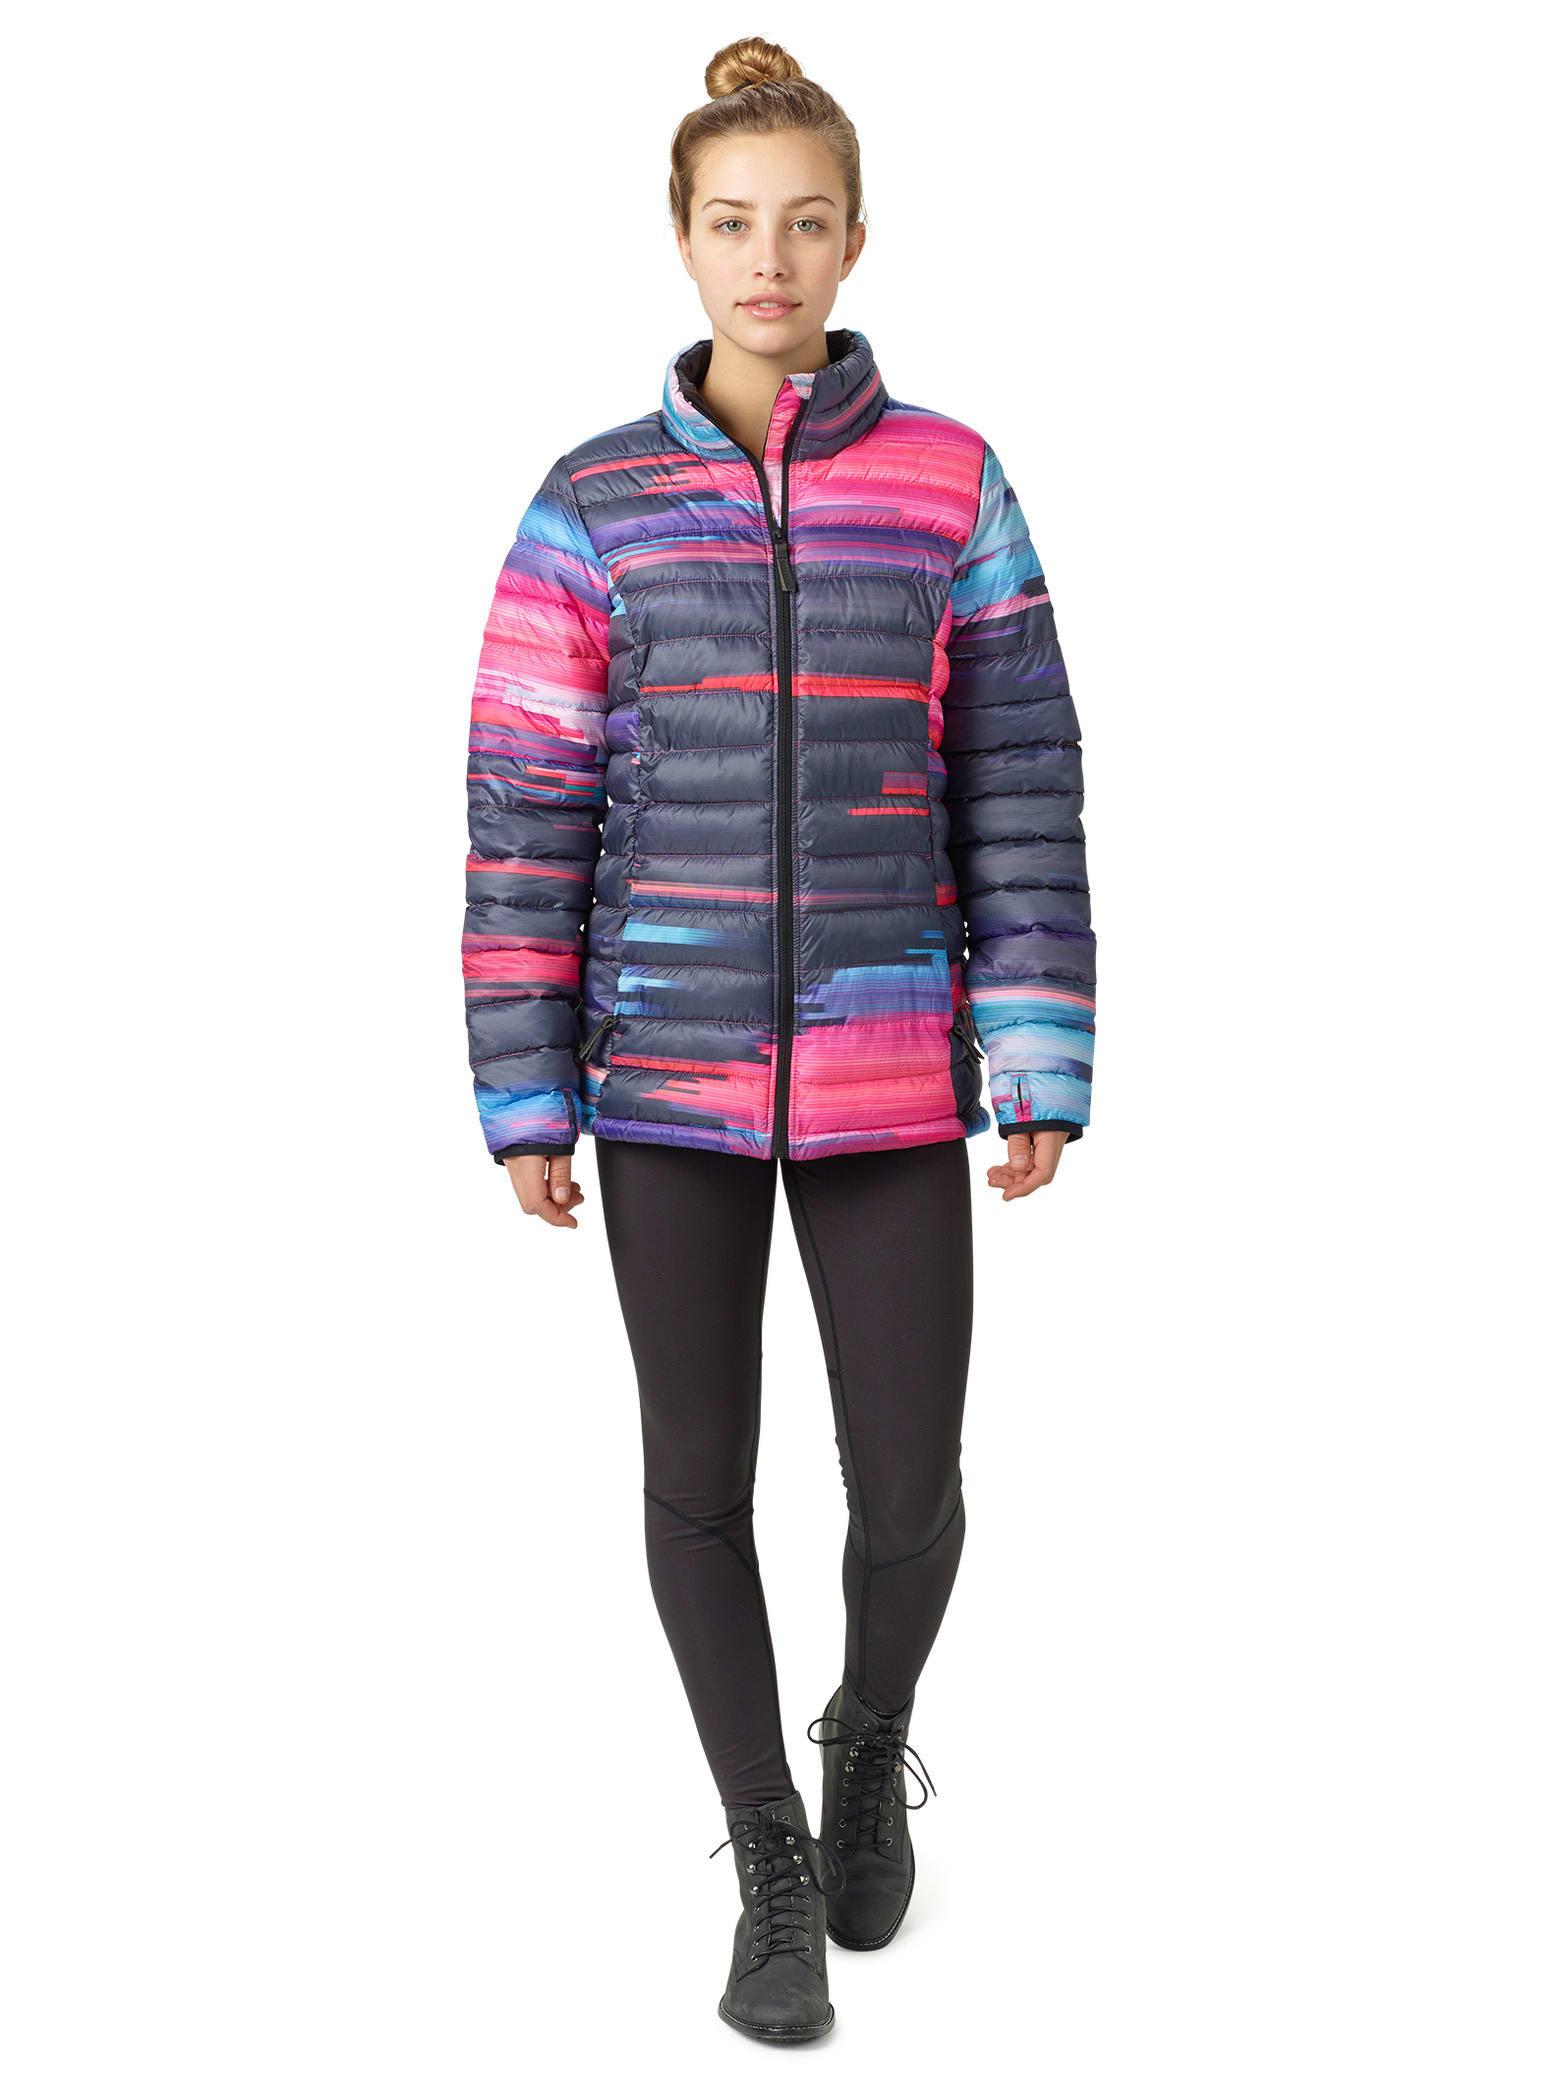 Presidents Day Sale Kids Ski Clothing